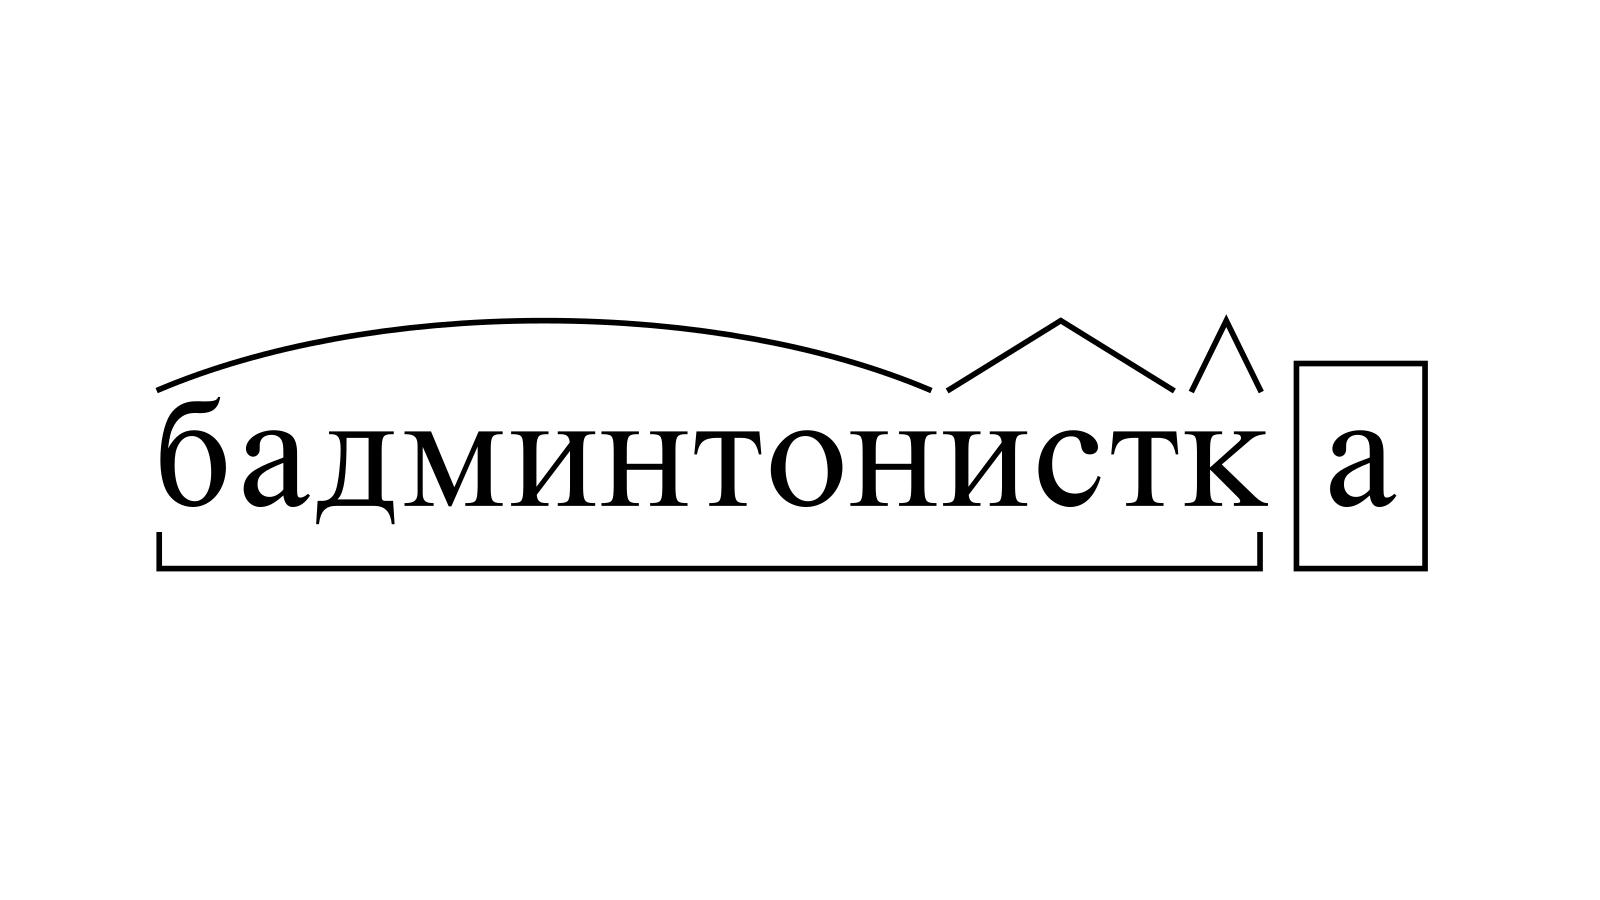 Разбор слова «бадминтонистка» по составу